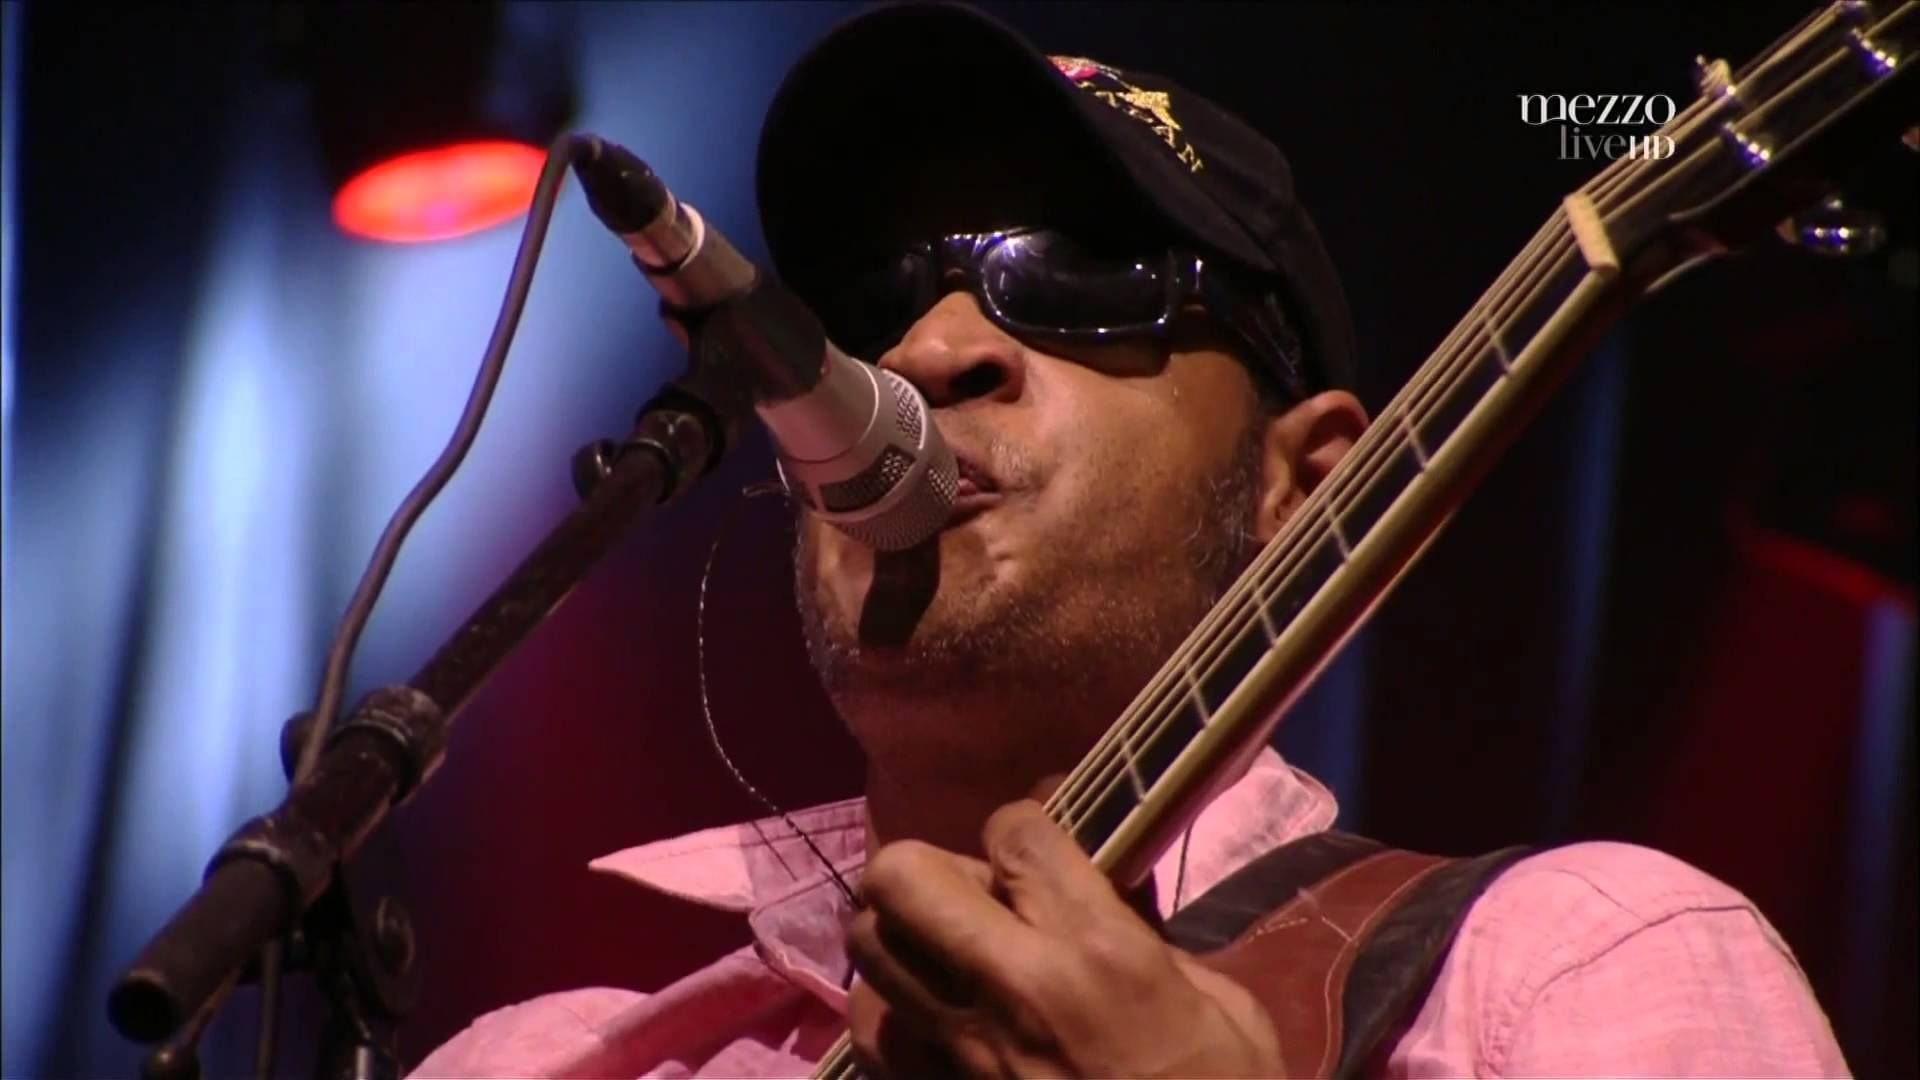 Raul midon richard bona jazz in marciac musique et danse